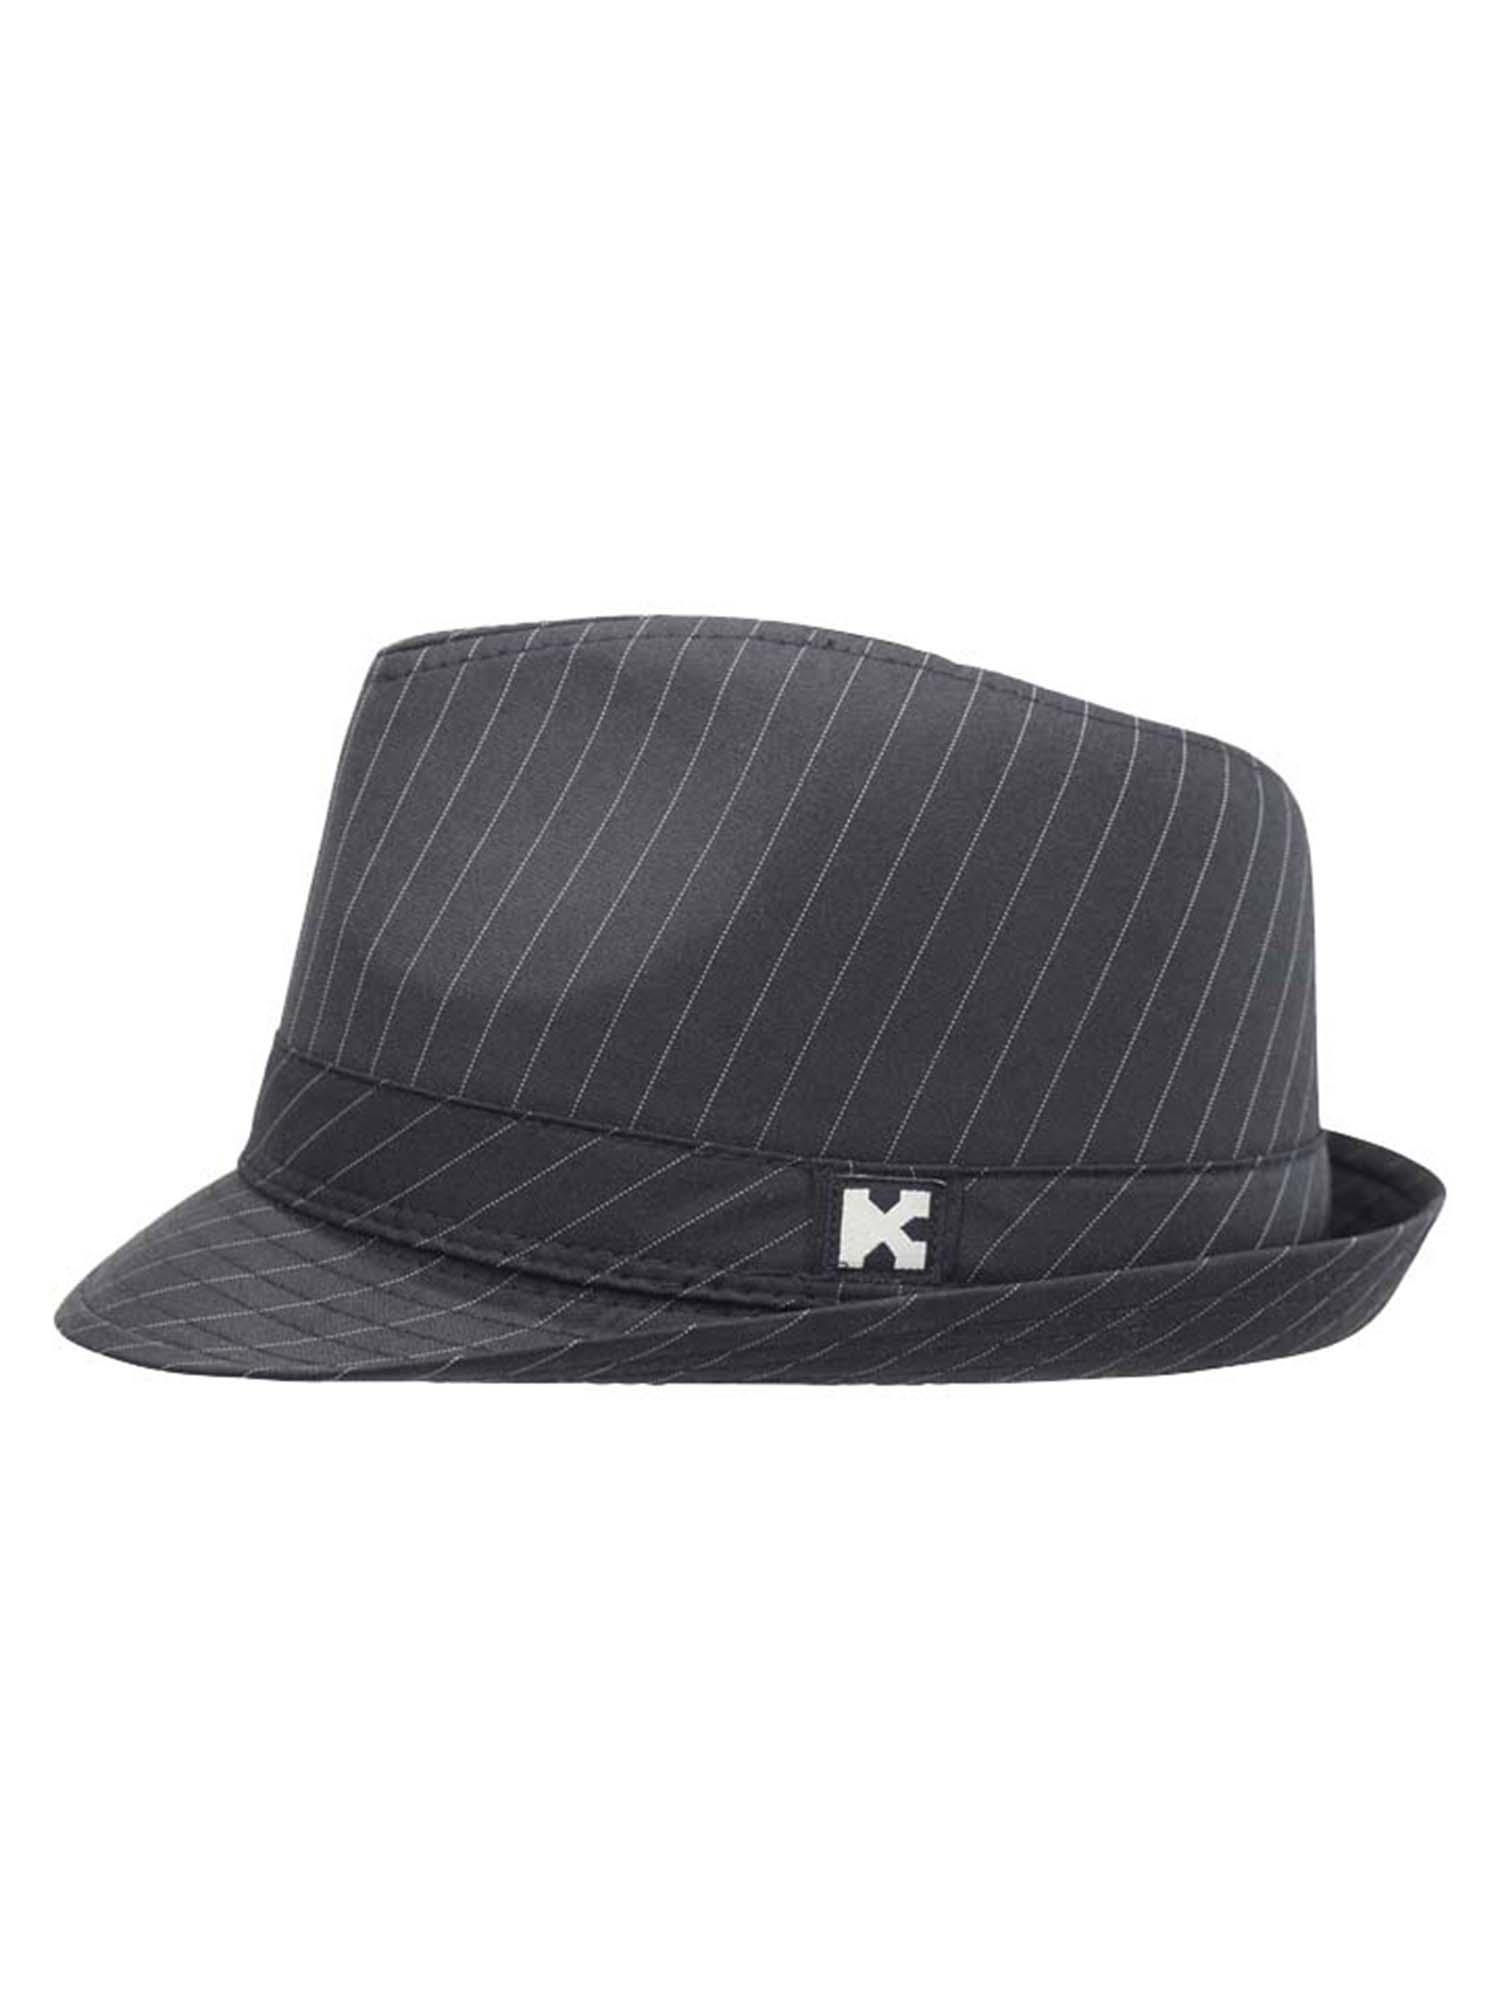 4c453c711cc7d Luxury Divas Black Classic Pinstripe Trilby Fedora Hat